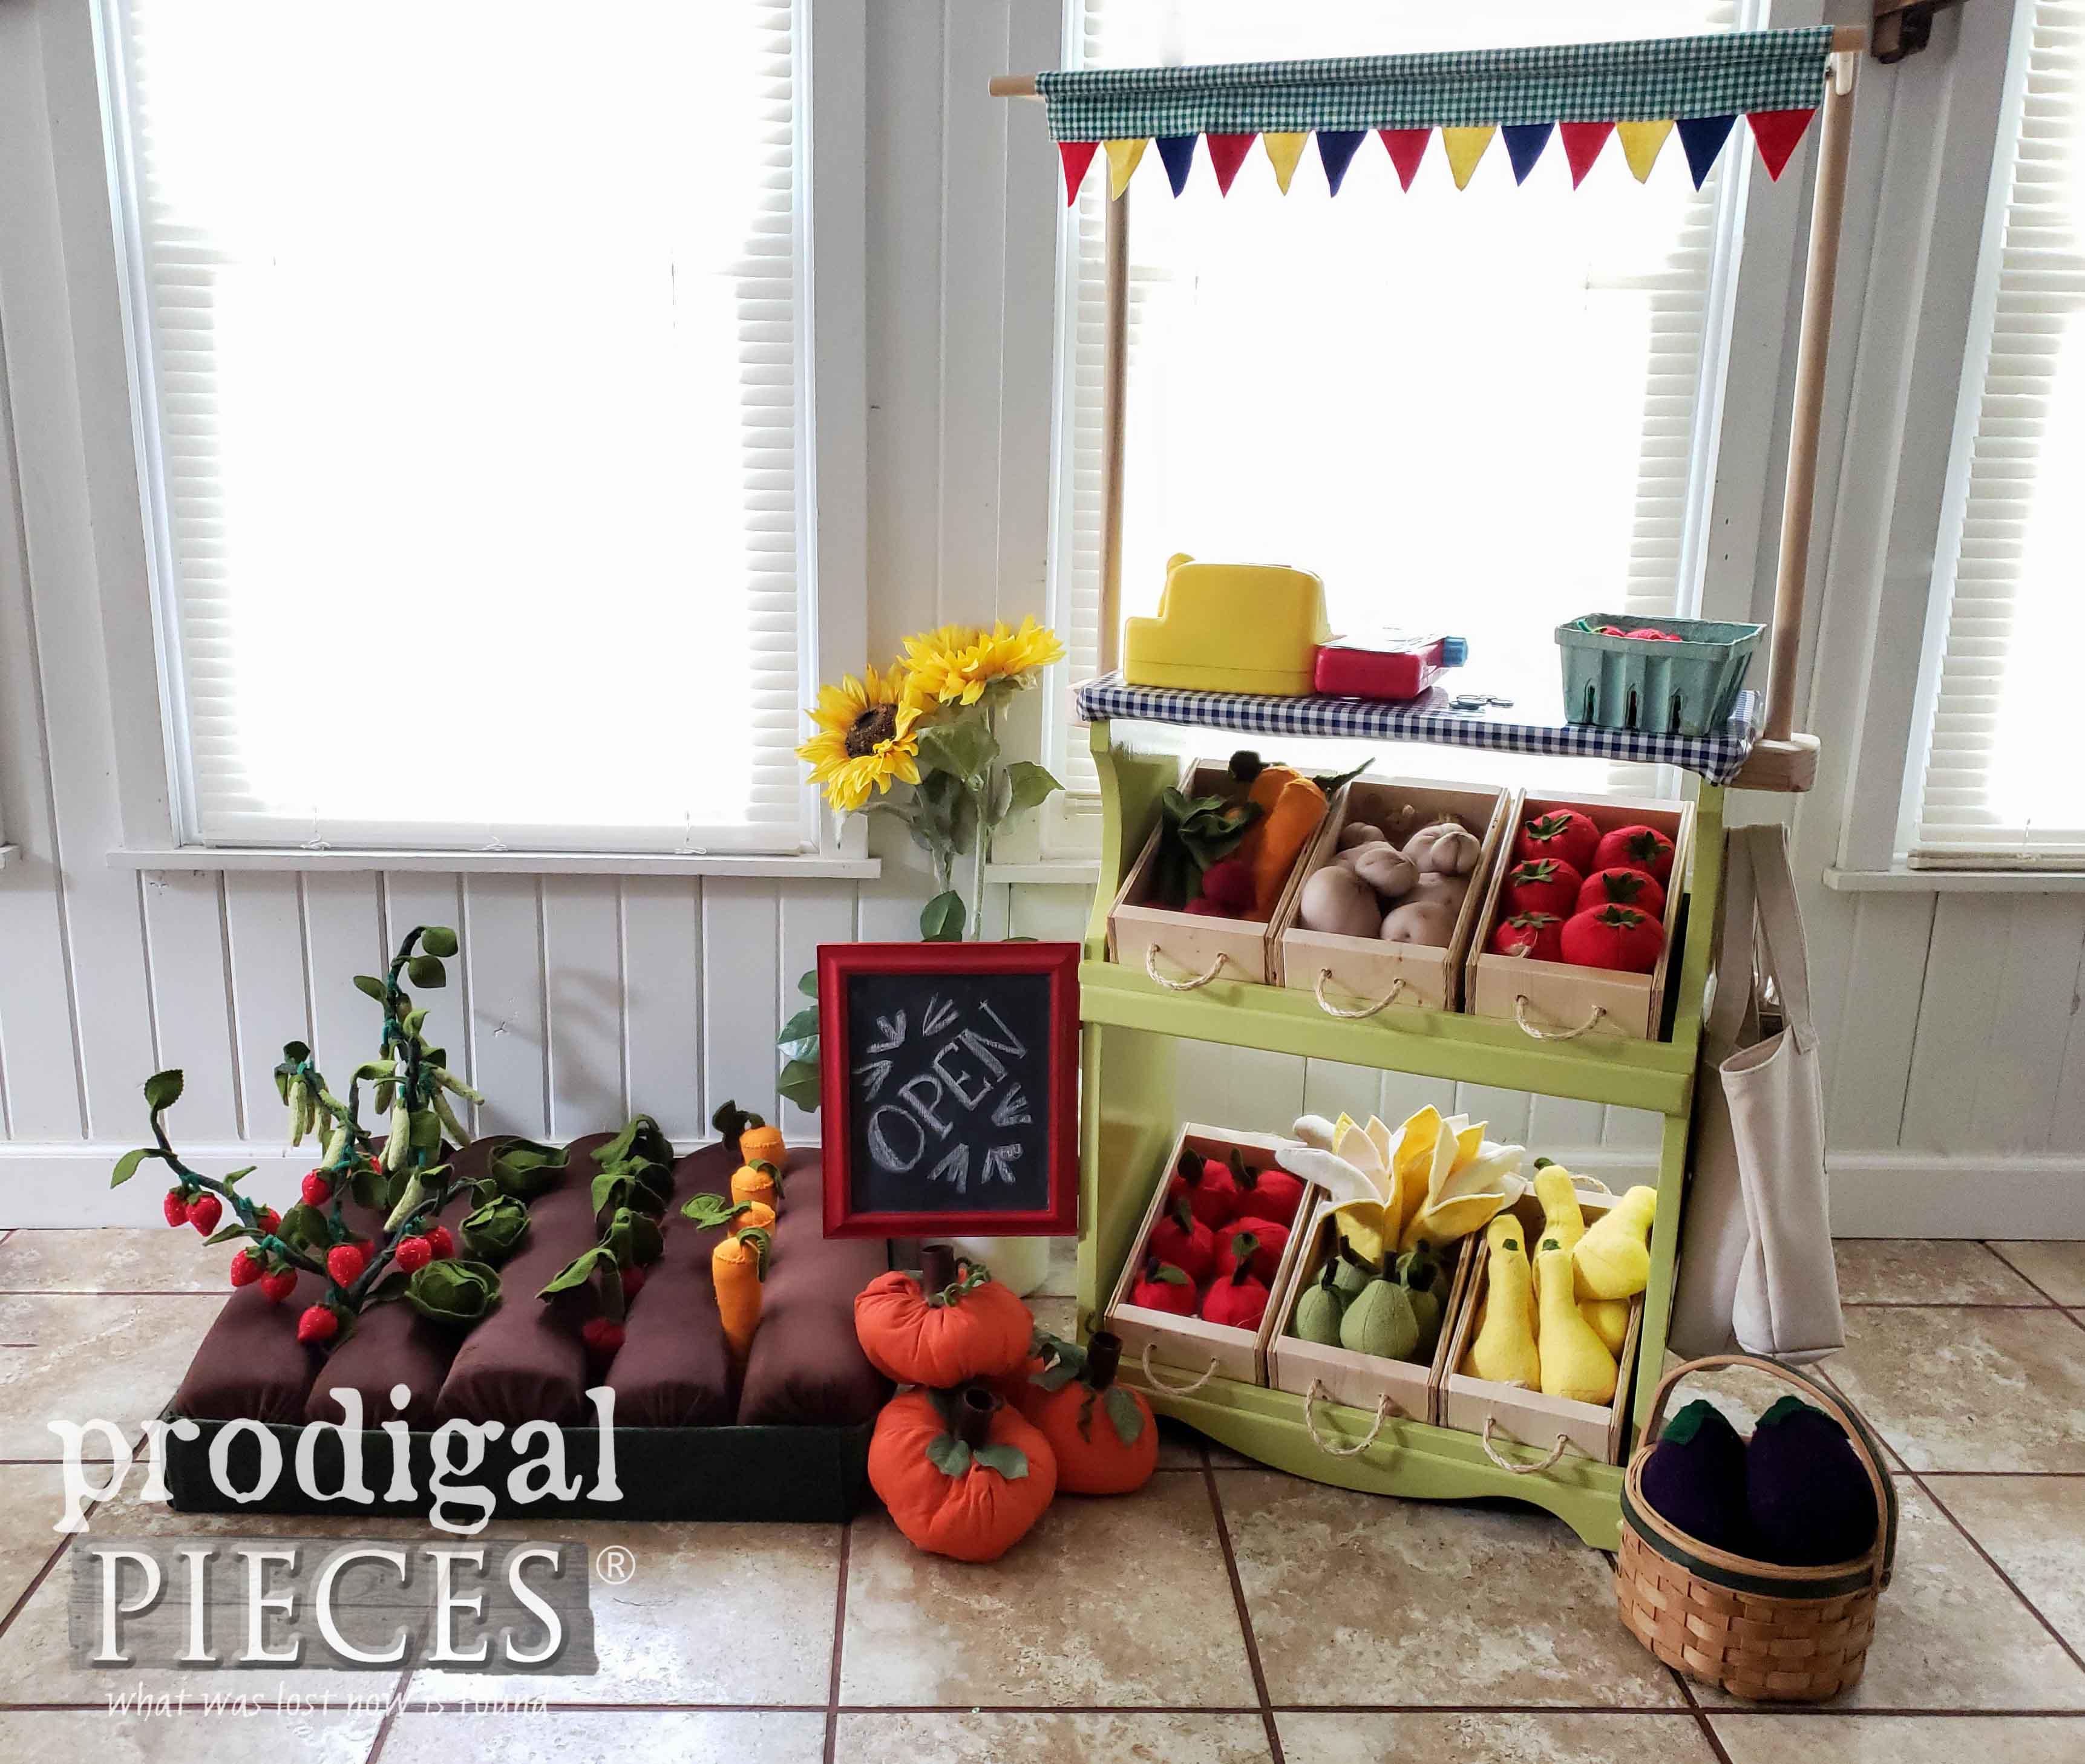 DIY Pretend Farmer's Market for Kids handmade by Larissa of Prodigal Pieces | prodigalpieces.com #prodigalpieces